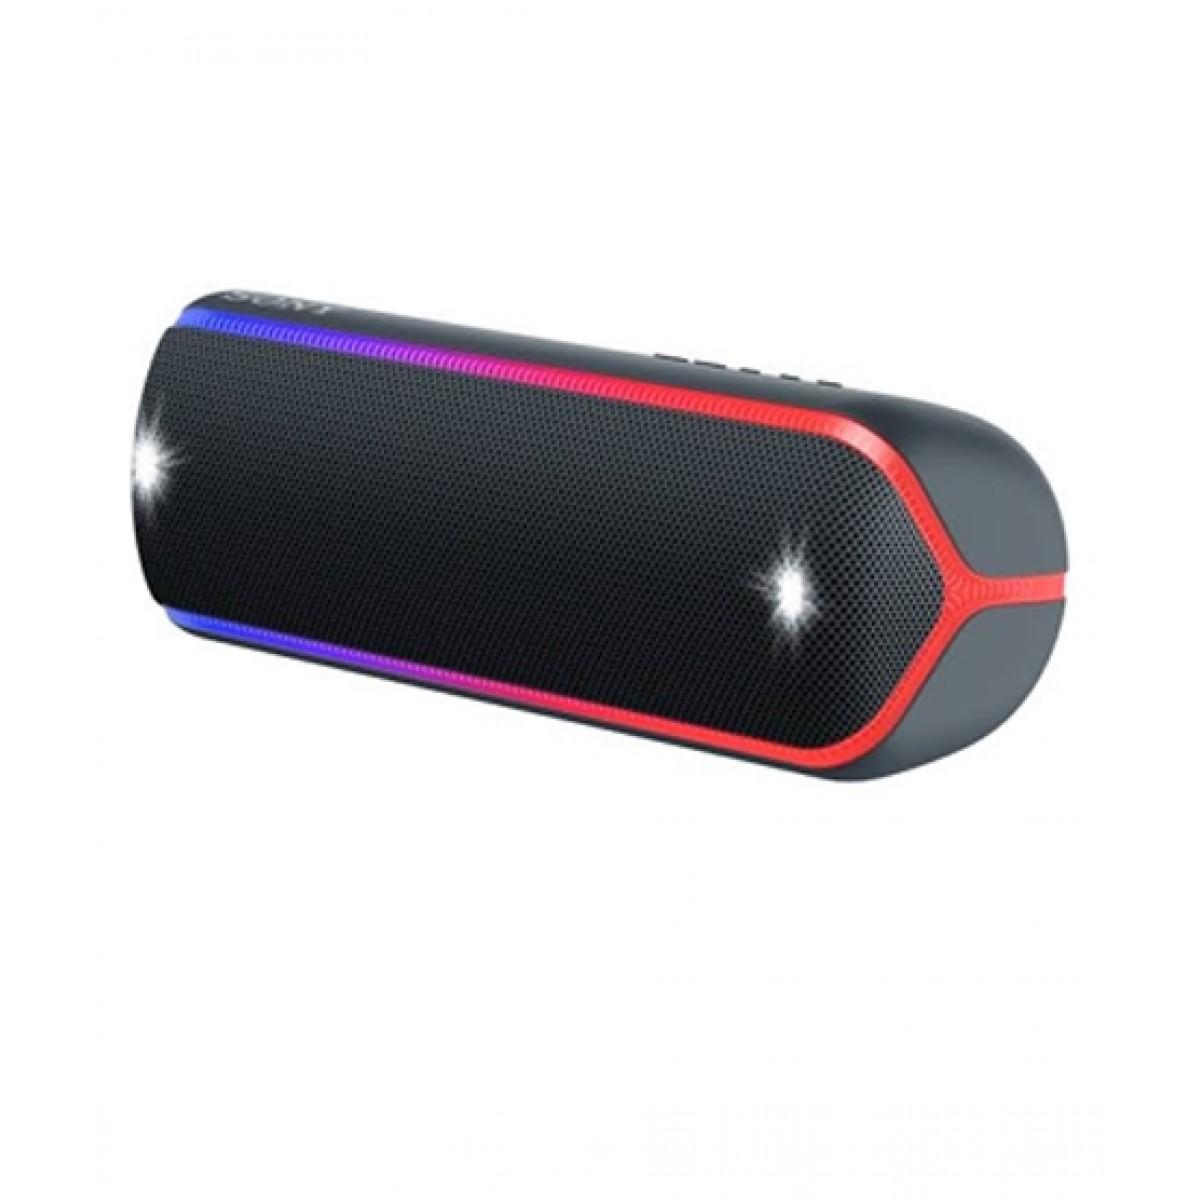 Sony Portable Wireless Speaker Black Srs Xb32 Price In Pakistan Buy Sony Extra Bass Portable Wireless Bluetooth Speaker Black Srs Xb32 Ishopping Pk